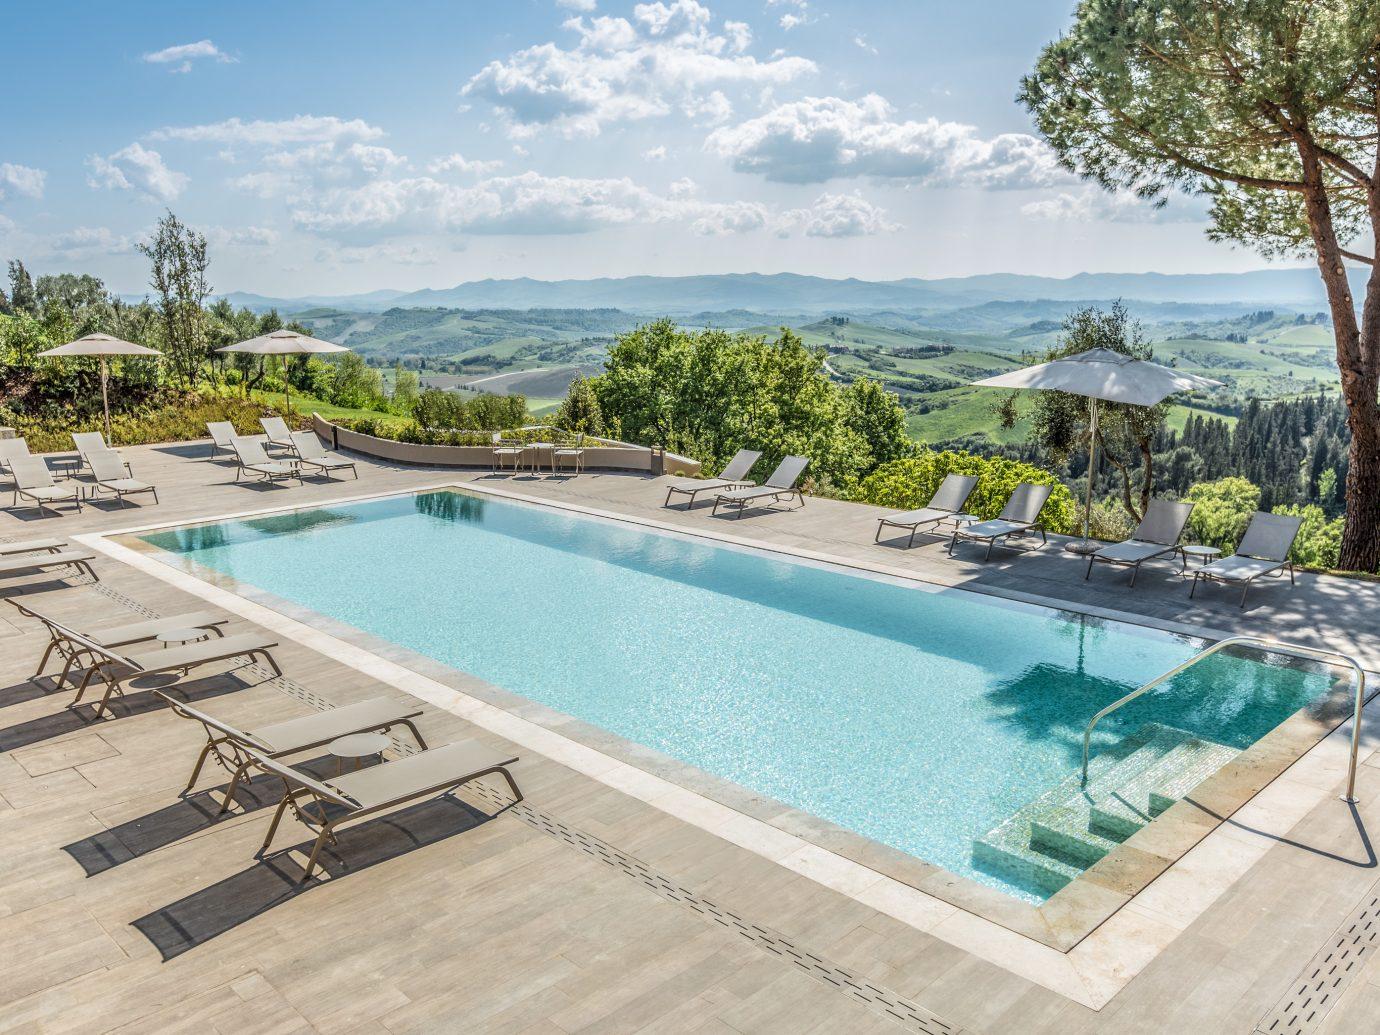 Pool at Hotel Il Castelfalfi in Tuscany